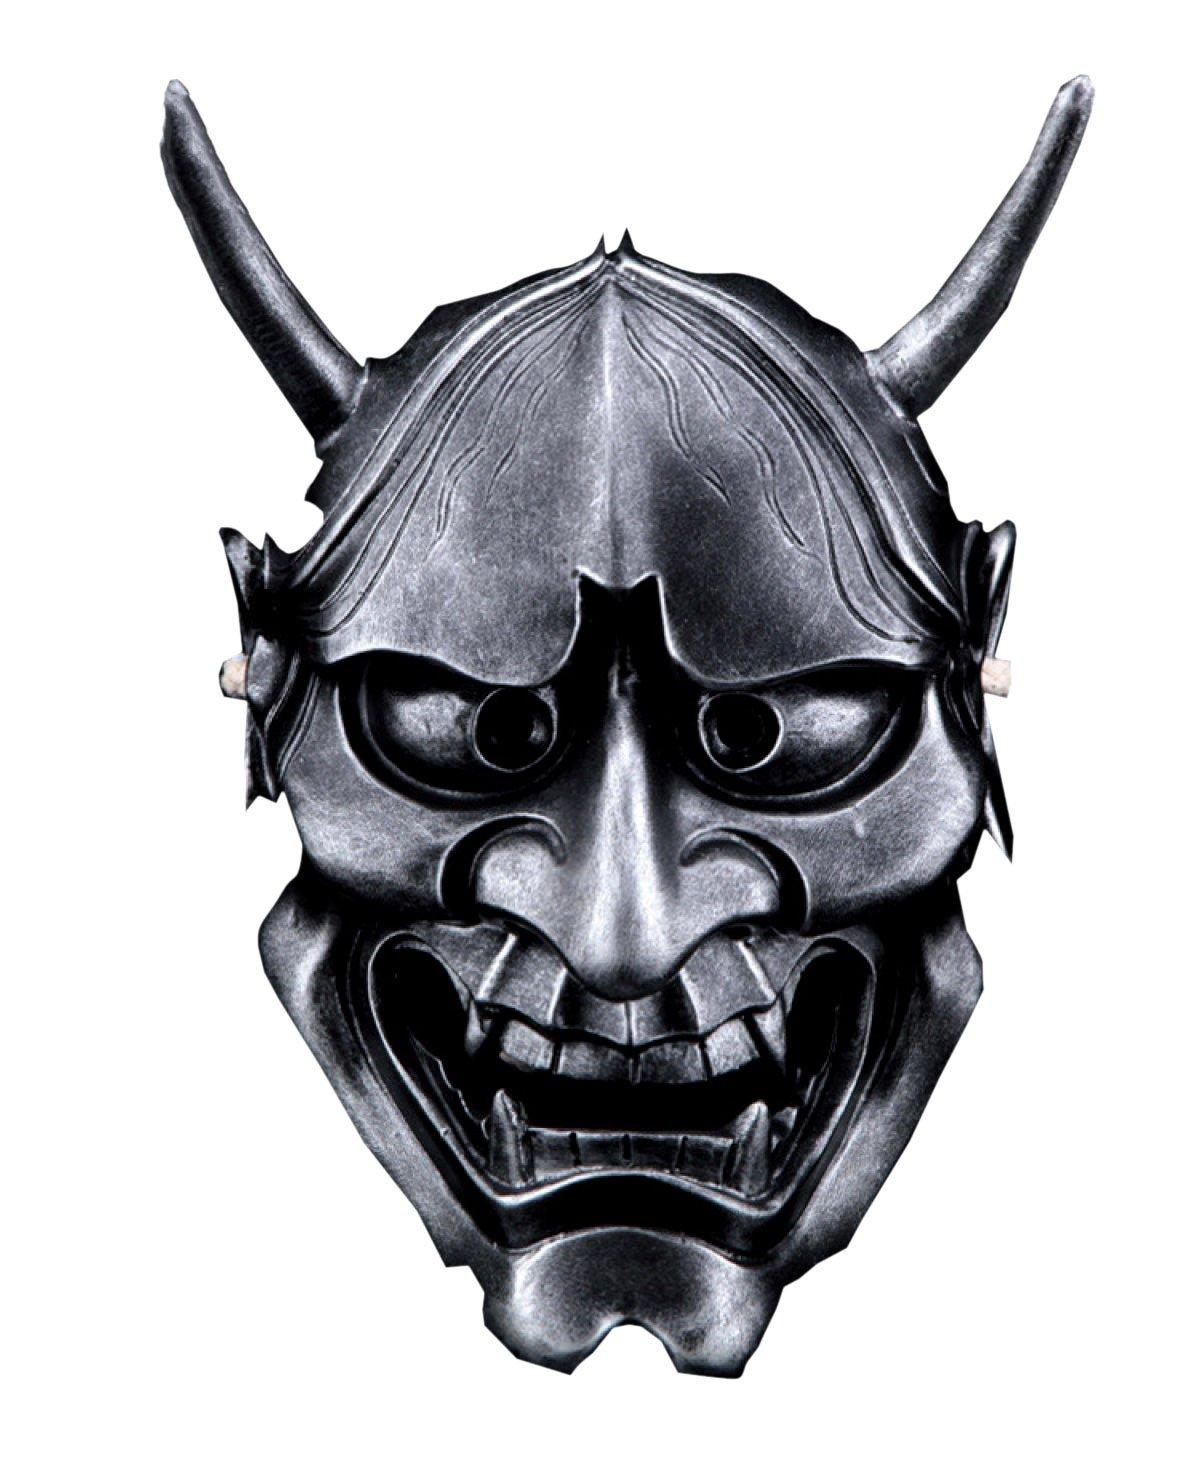 Nihiug Halloween Seltener Schmetterling Kopf Wie Maske Cosplay Upscale Harz Handwerk Maske Corpse Overhead Maske Scaryt Halloween,C